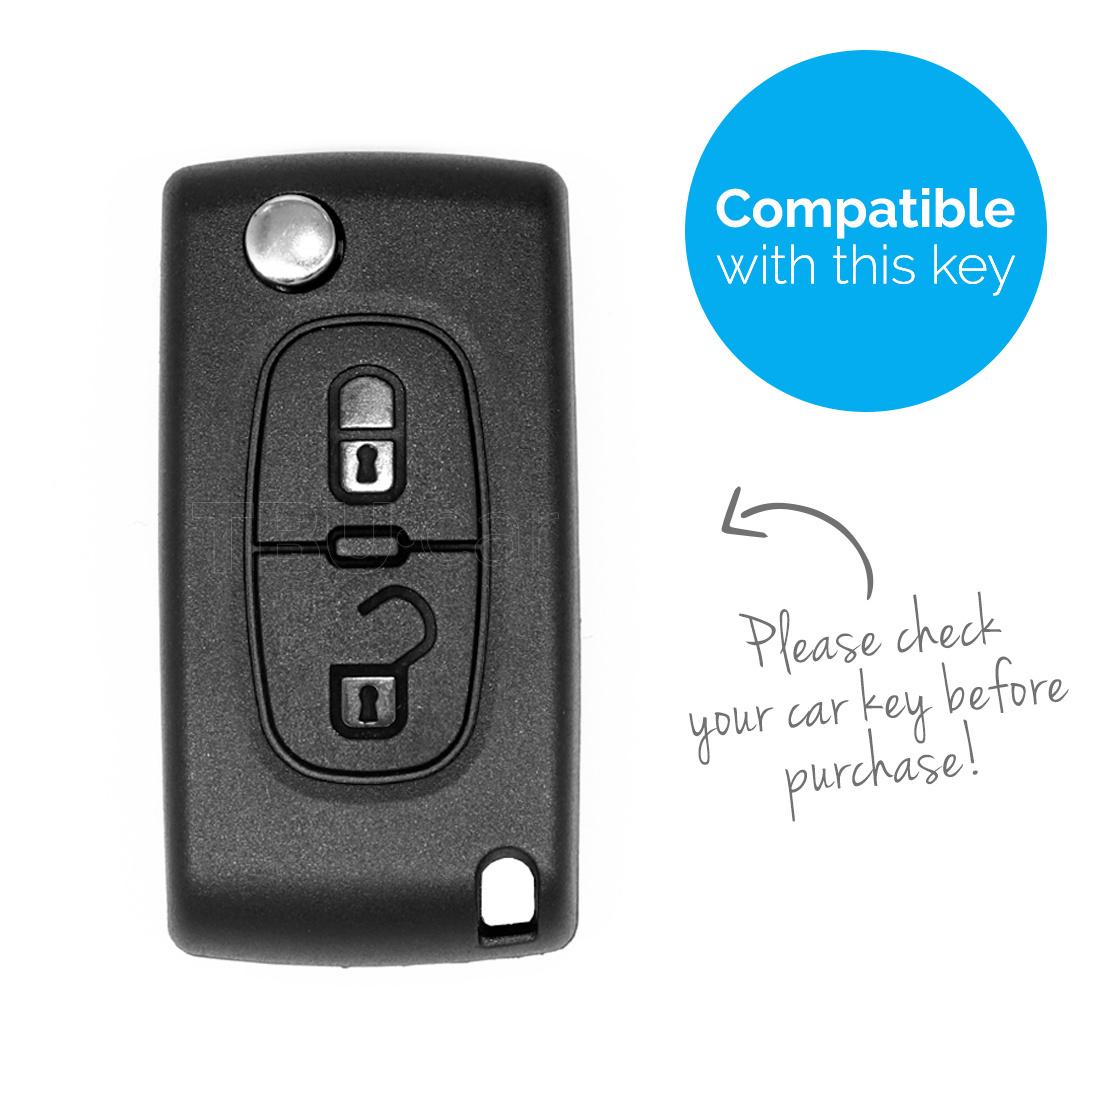 TBU car TBU car Car key cover compatible with Citroën - Silicone Protective Remote Key Shell - FOB Case Cover - Blue